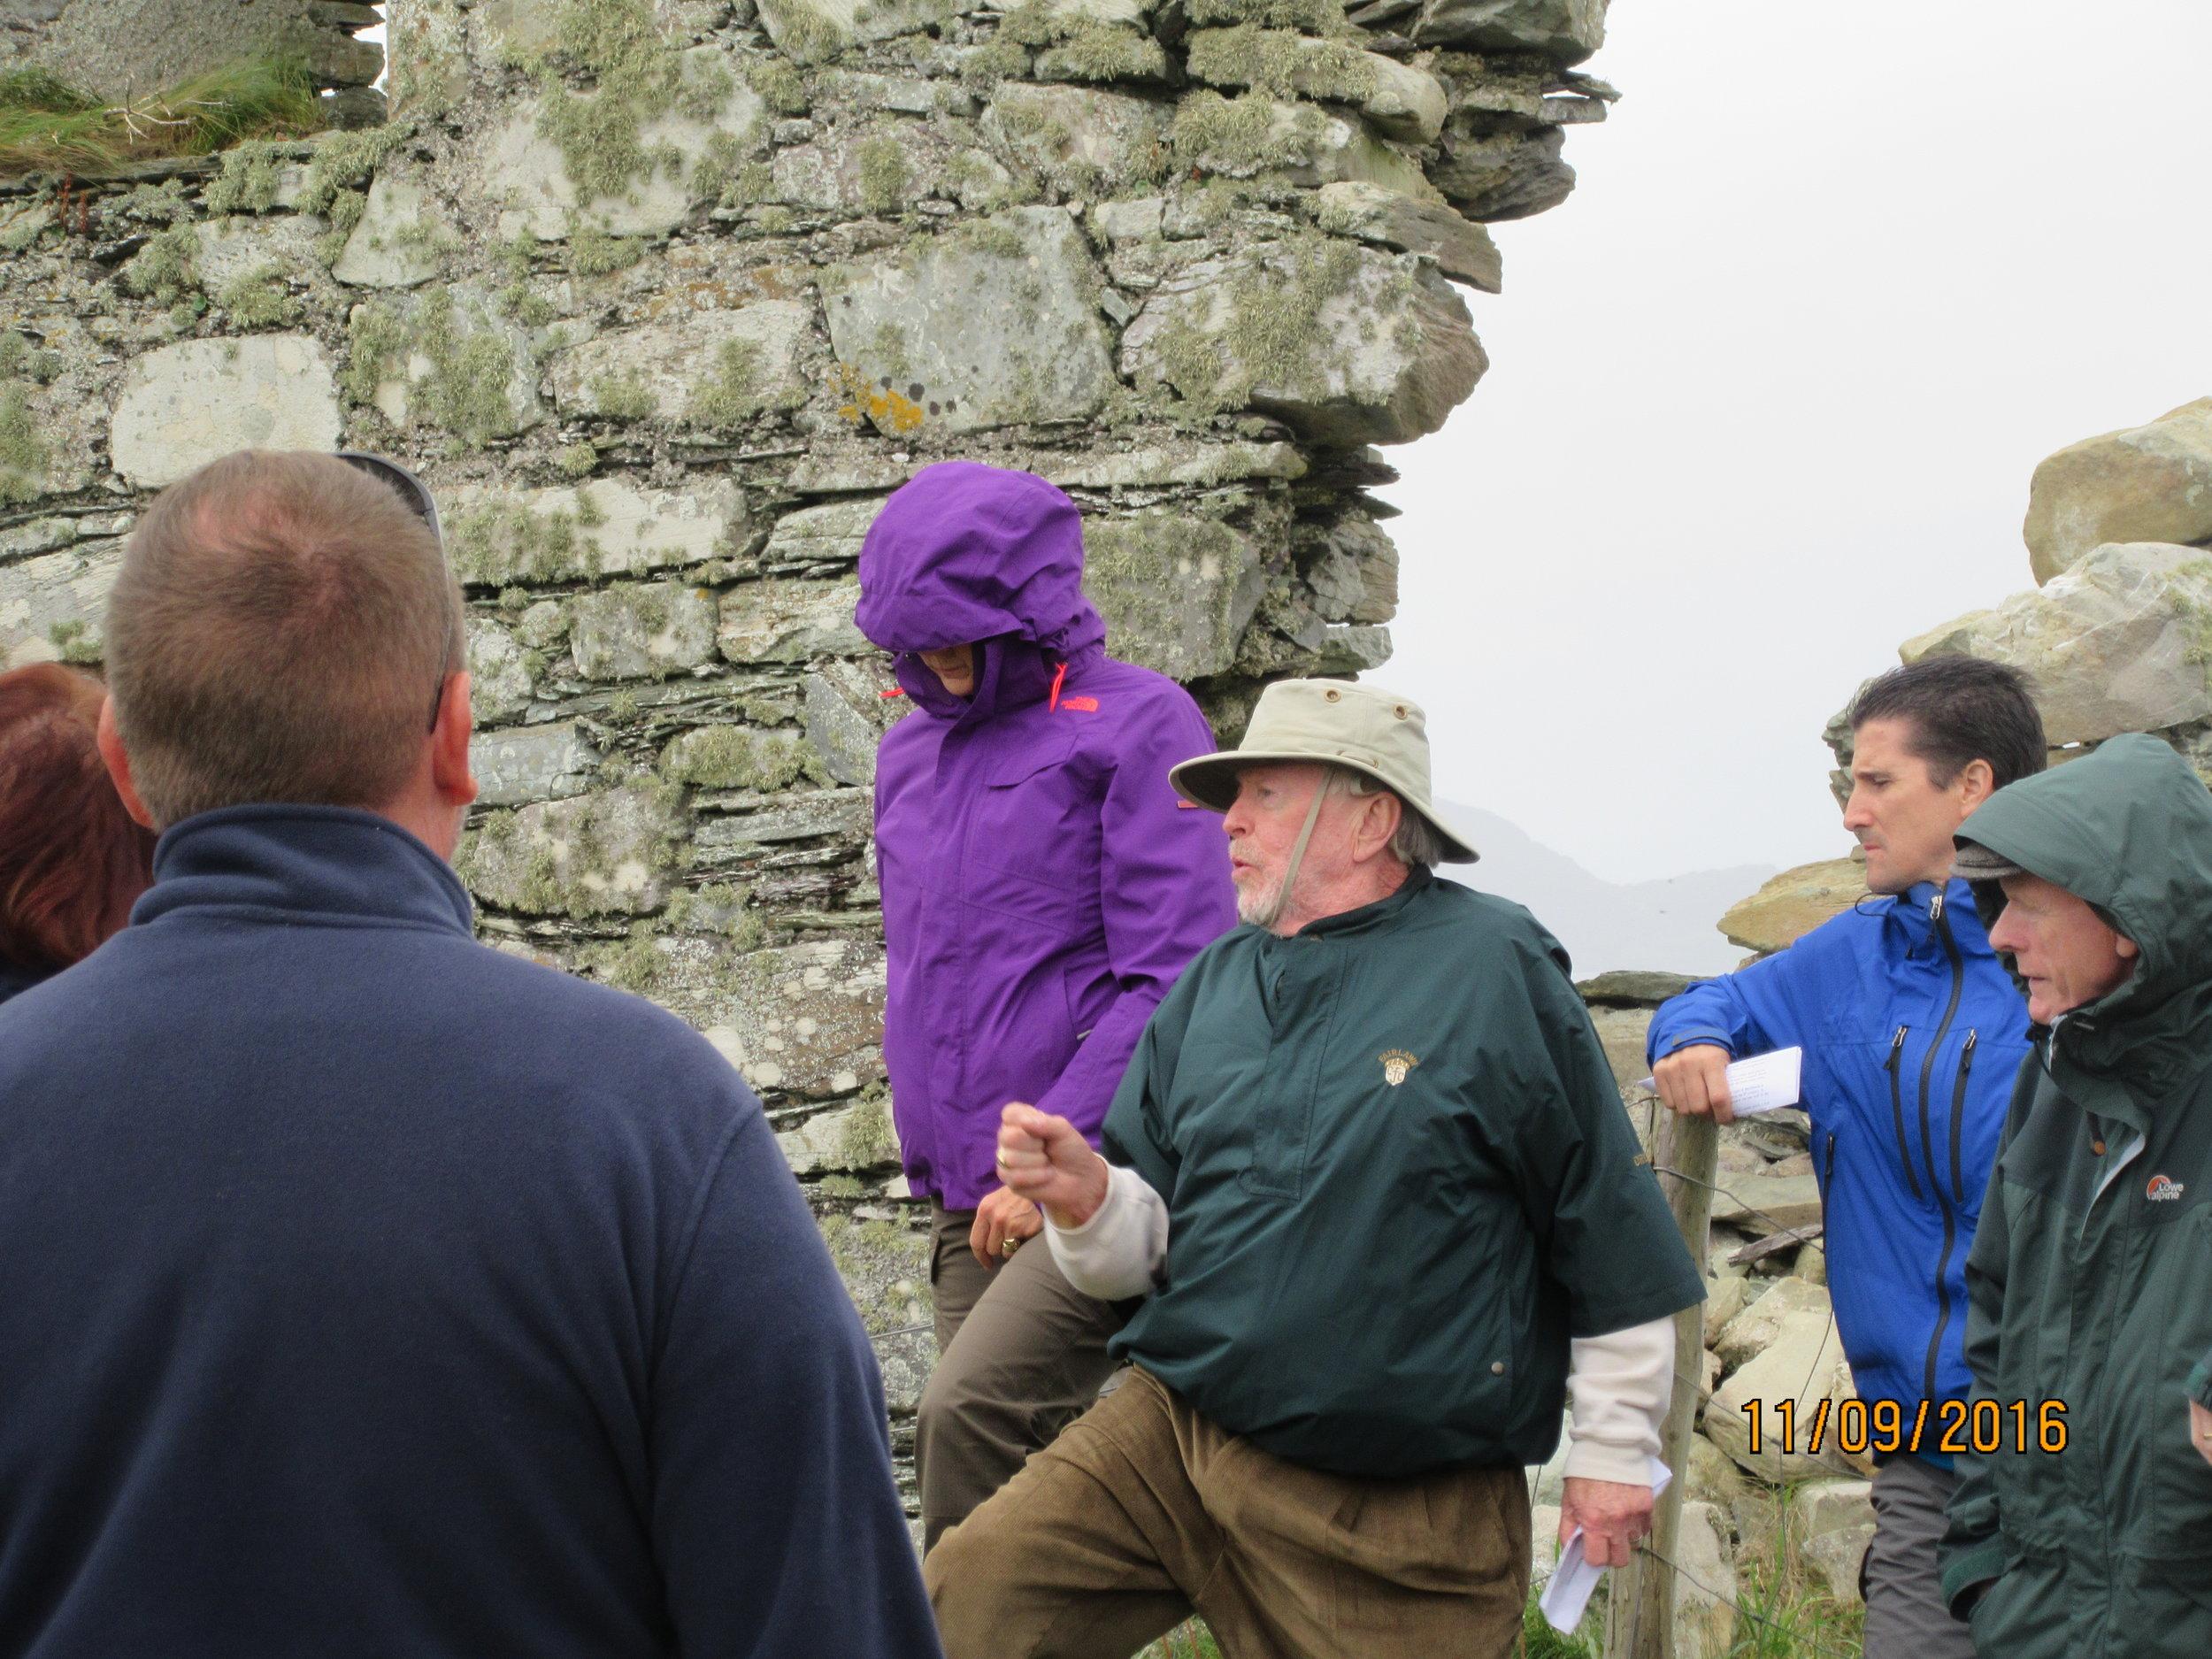 Thomas R. Crowley speaking at the Kilcatherine Graveyard. Crowley Gathering, September 2016.